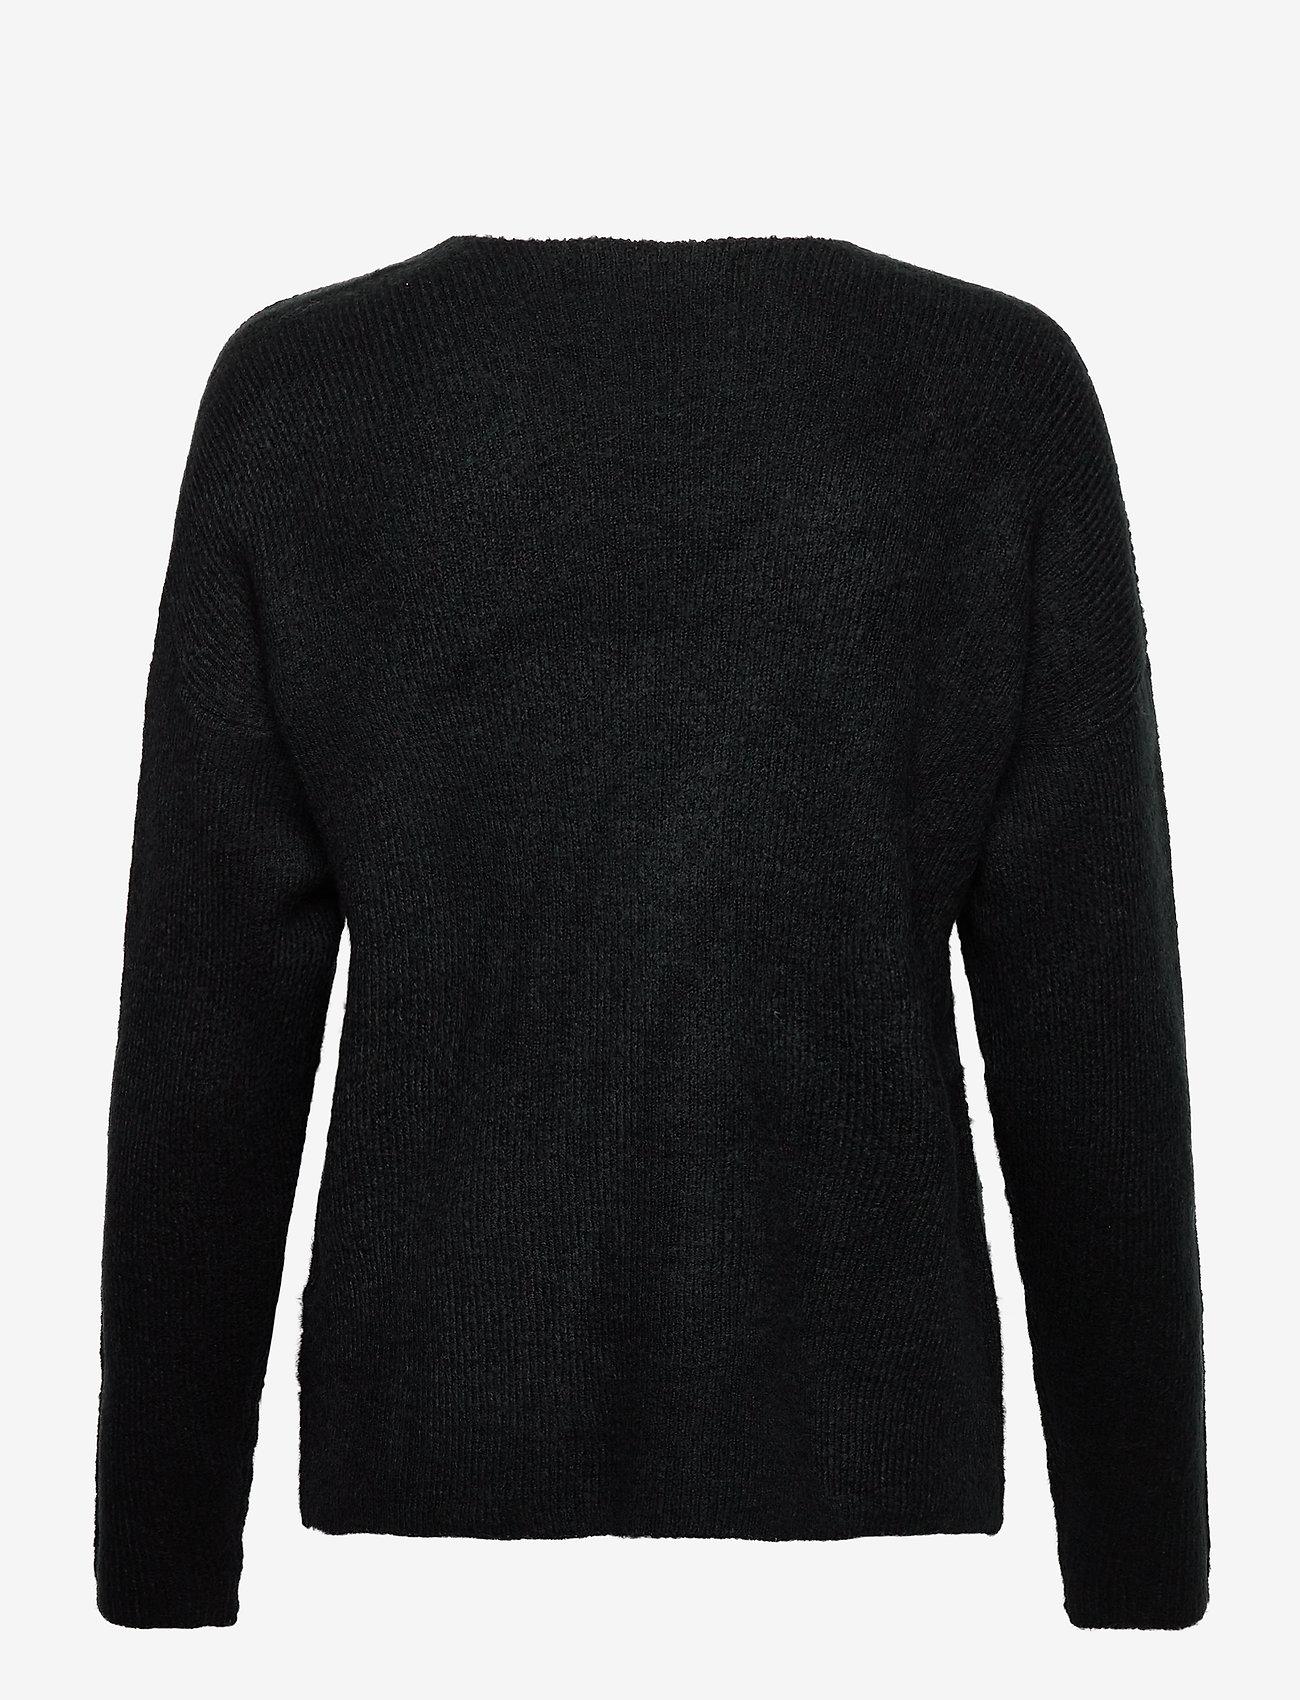 Vero Moda - VMCREWLEFILE LS V-NECK BLOUSE - tröjor - black - 1